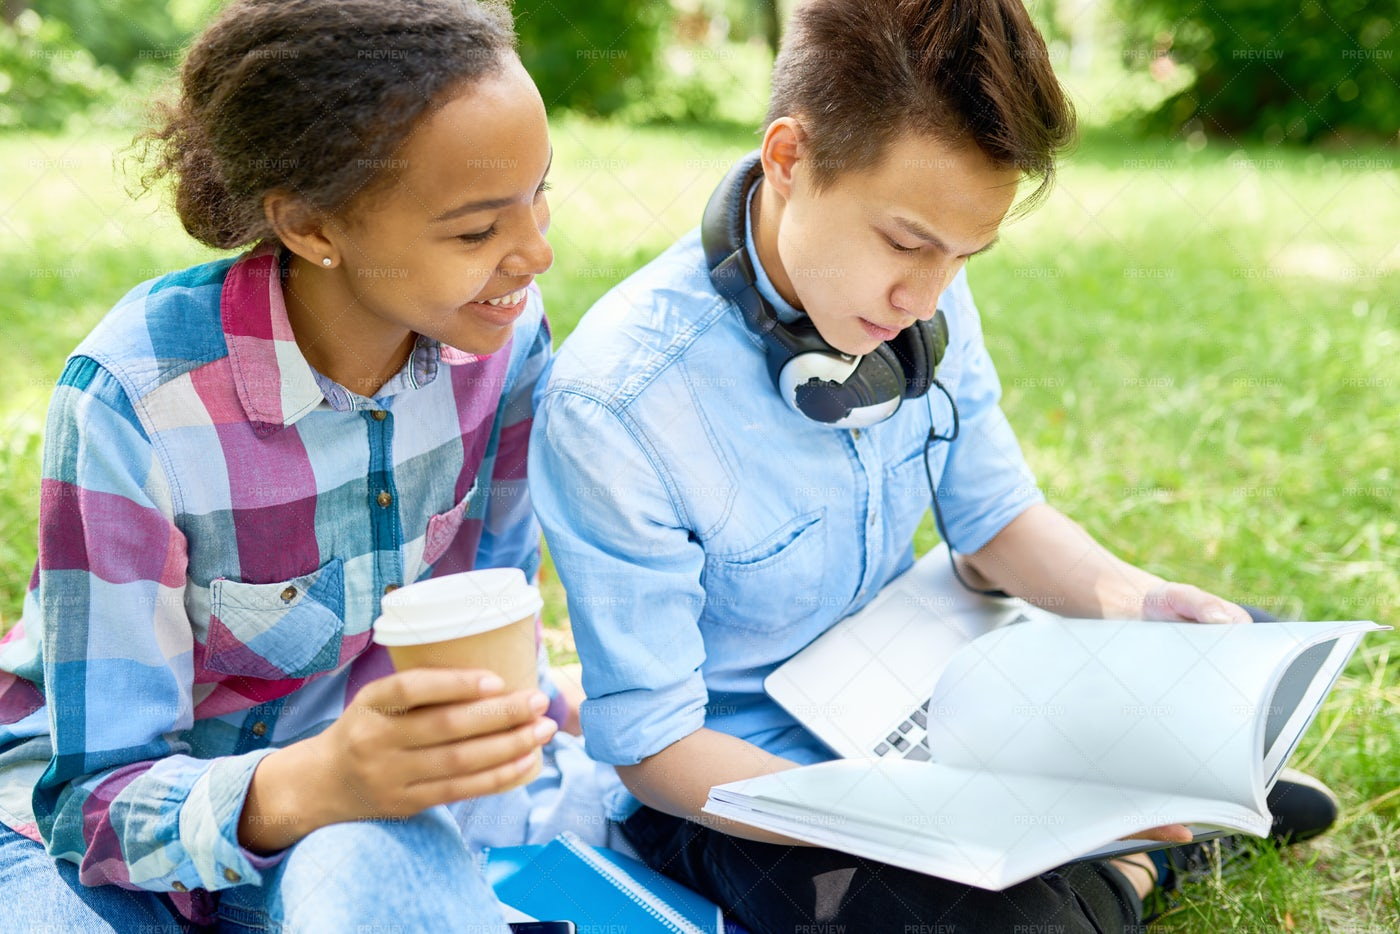 Students Doing Homework Outdoors: Stock Photos